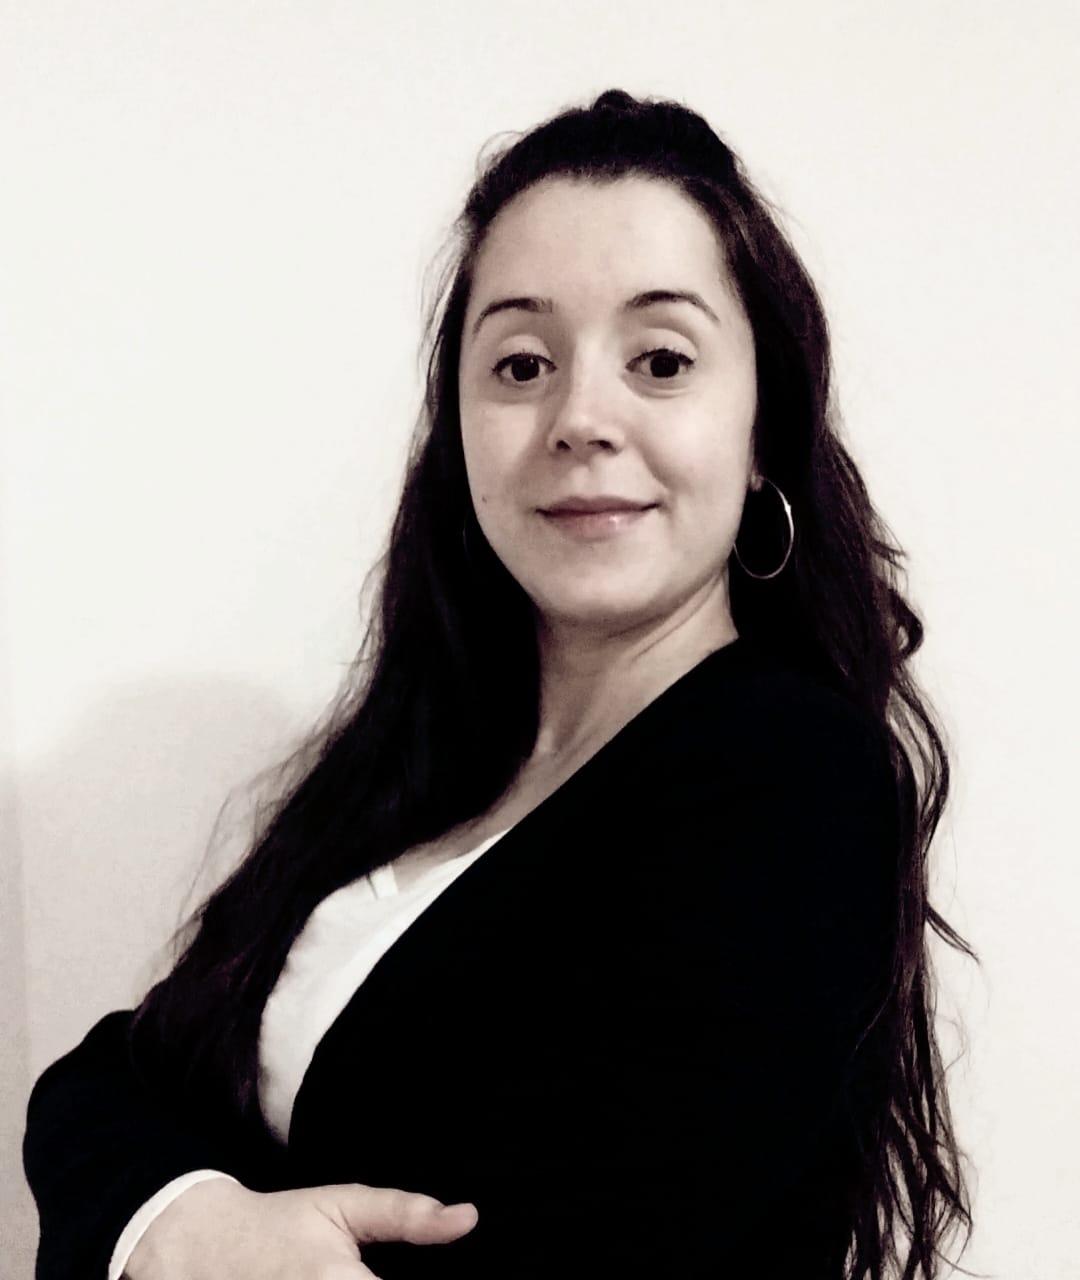 Miriam Solsona